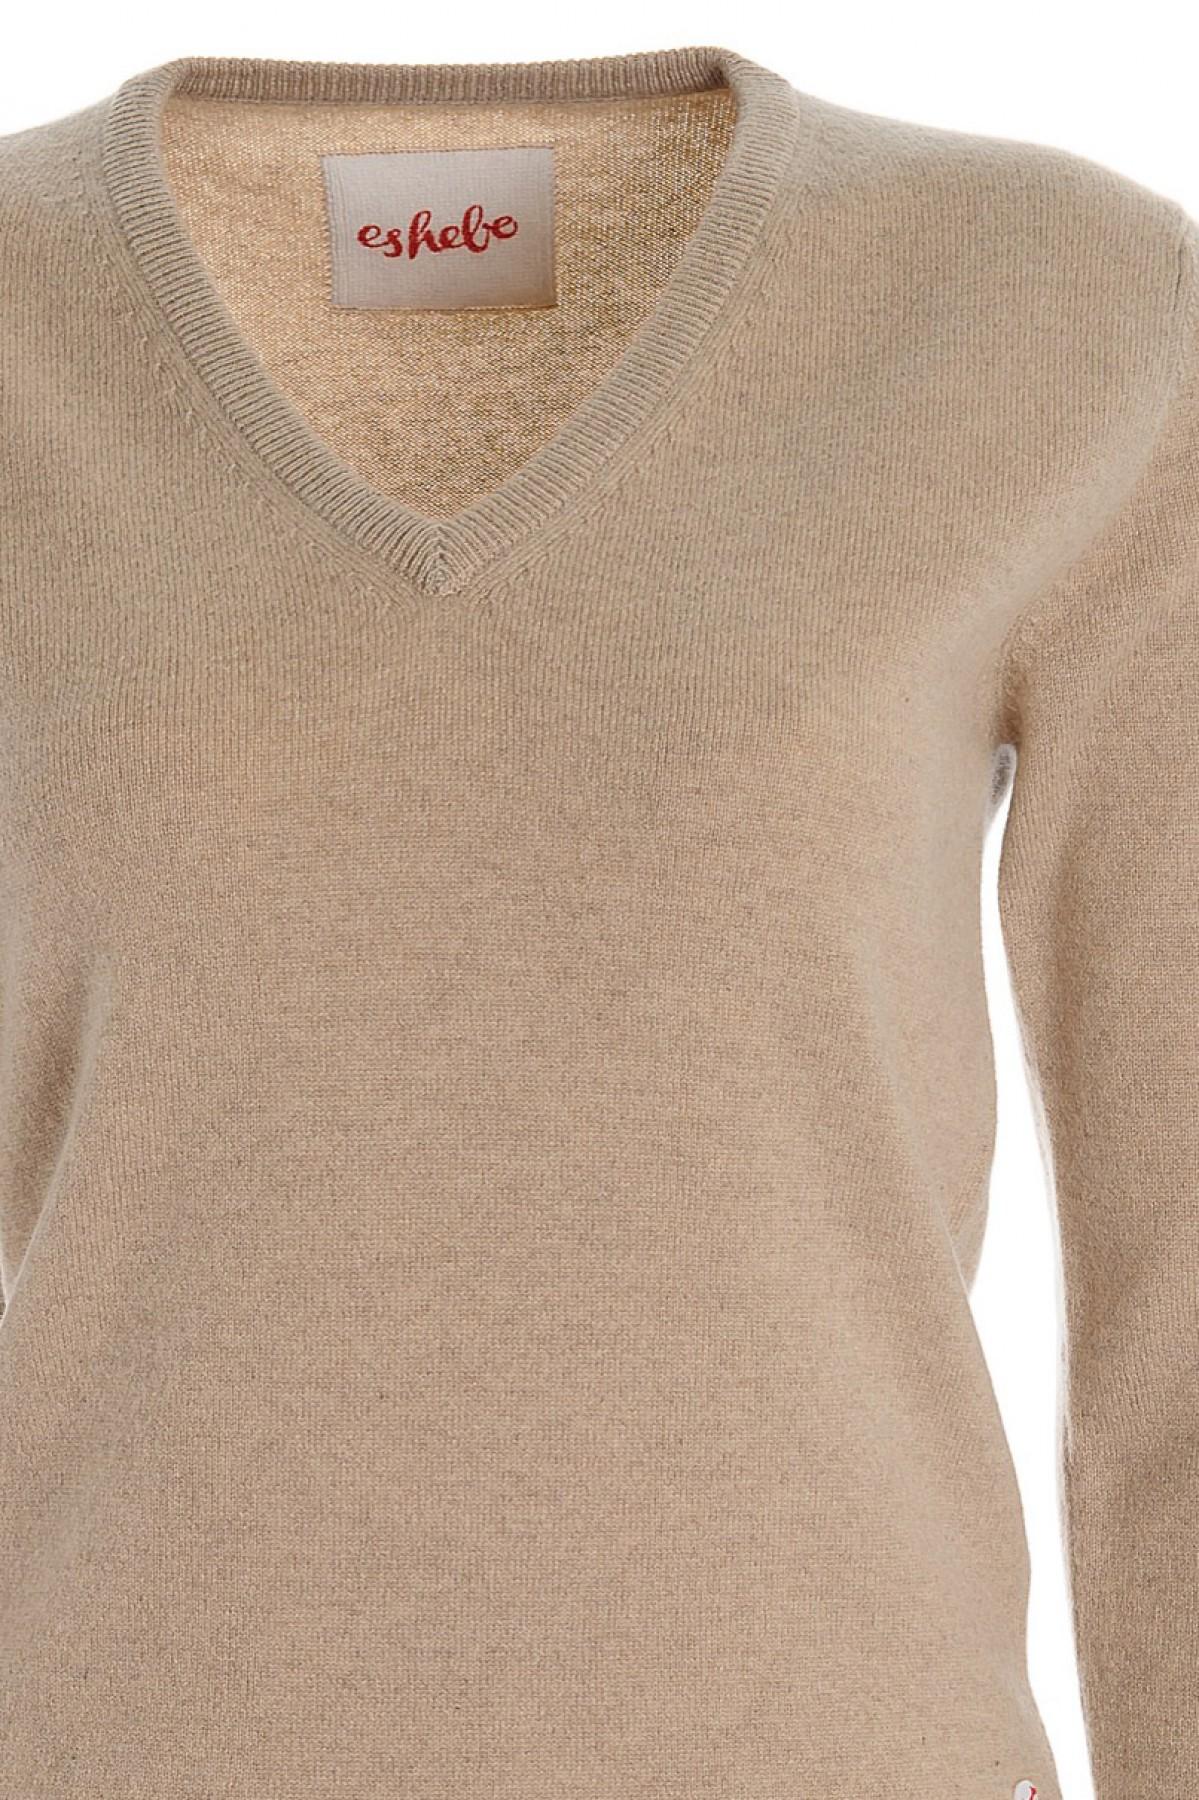 Women's cashmere V-neck sweater vicuna